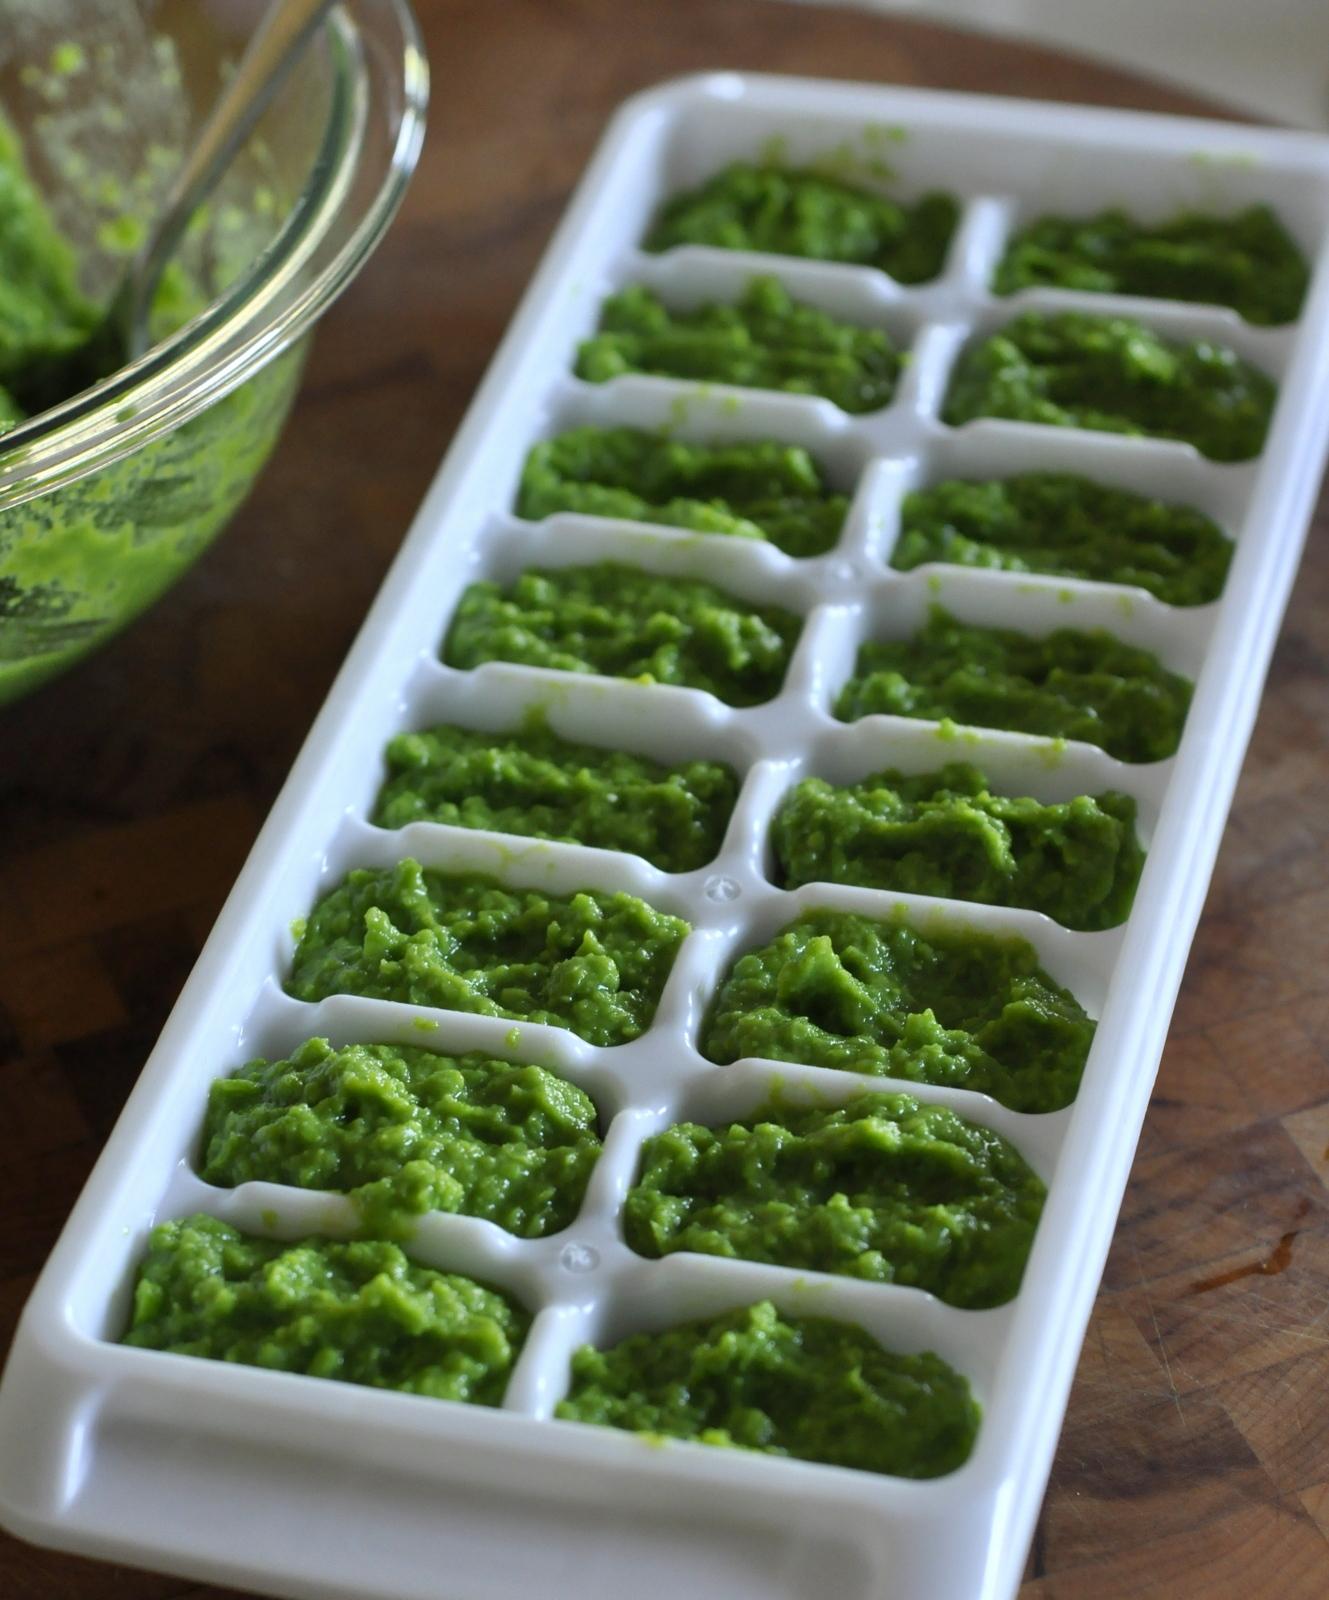 How-To-Make-Freeze-Homemade-Baby-Food-Pea-Puree-Recipe-tasteasyougo.com